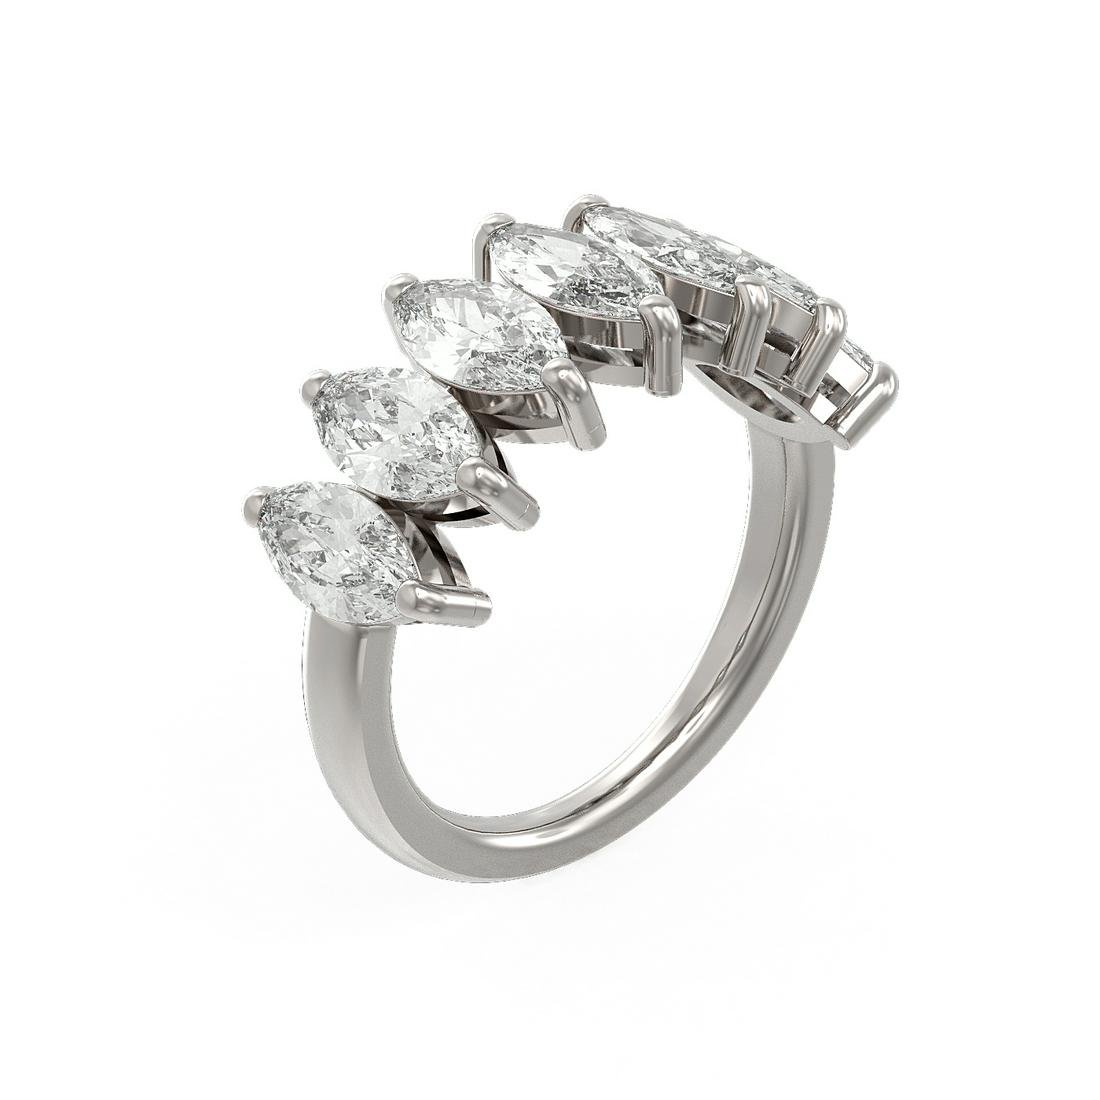 3.64 ctw Marquise Diamond Ring 18K White Gold -